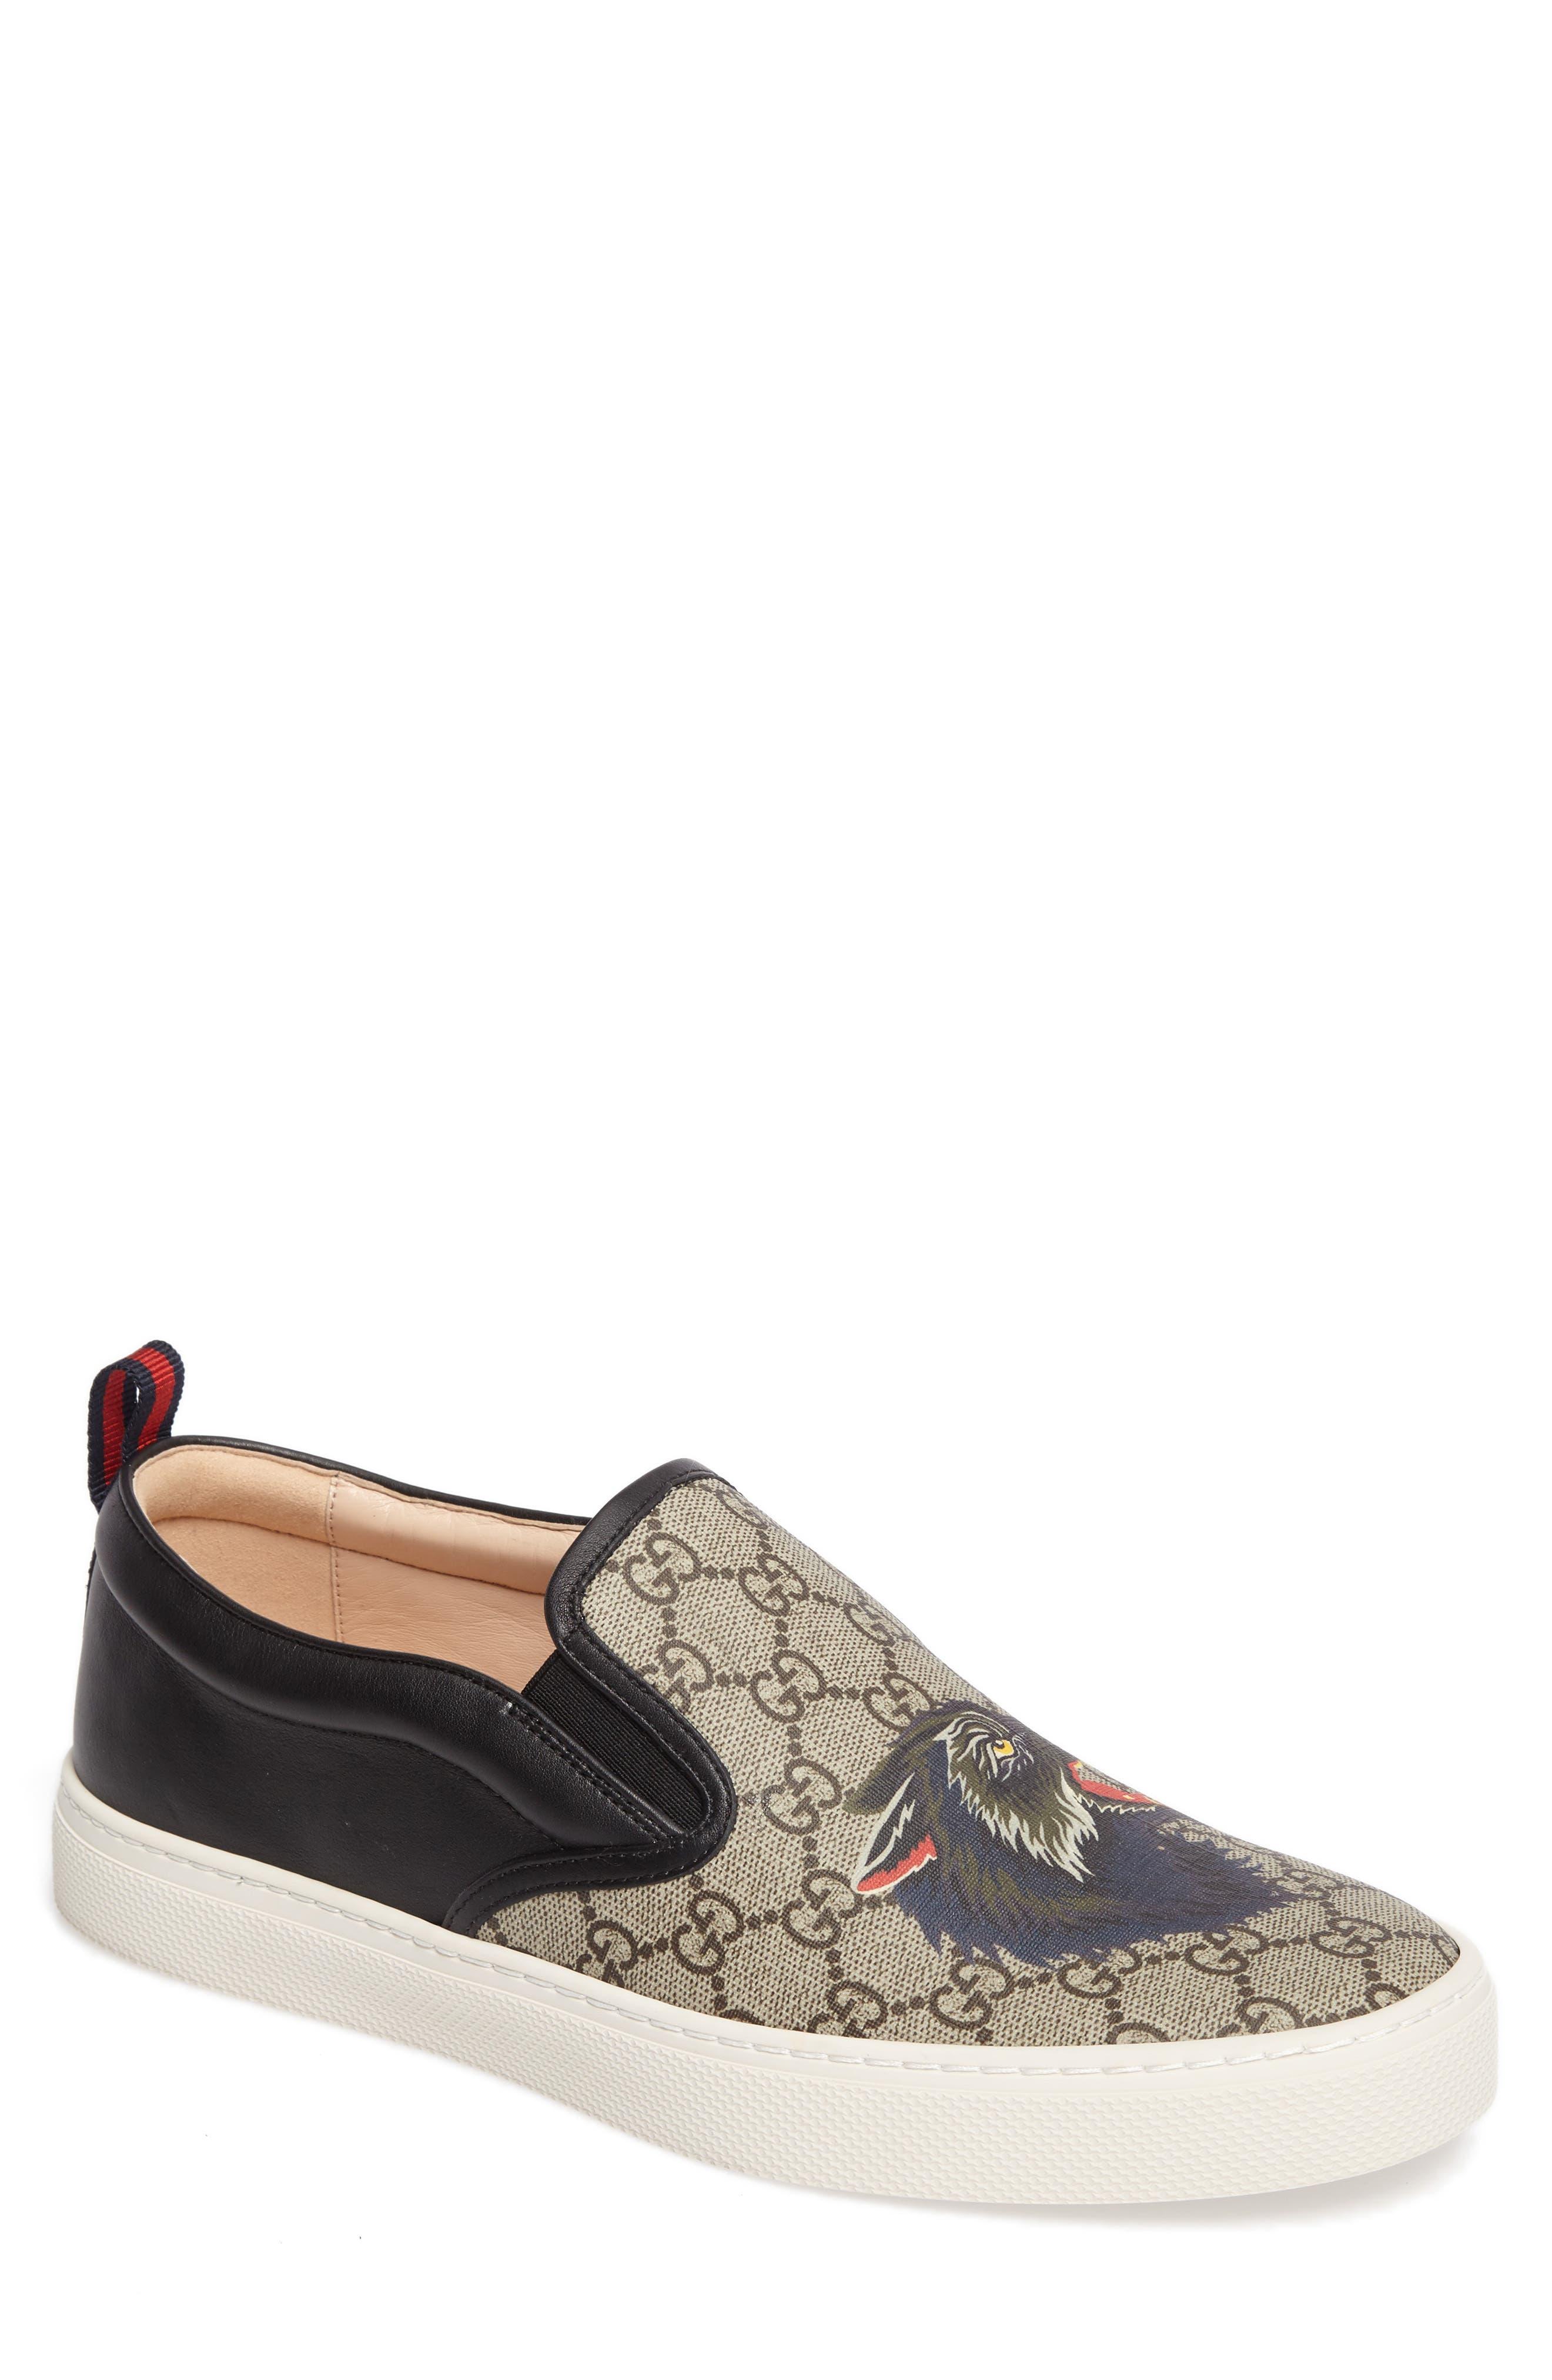 Wolf GG Supreme Slip-On Sneaker,                             Main thumbnail 1, color,                             BEIGE/ EBONY